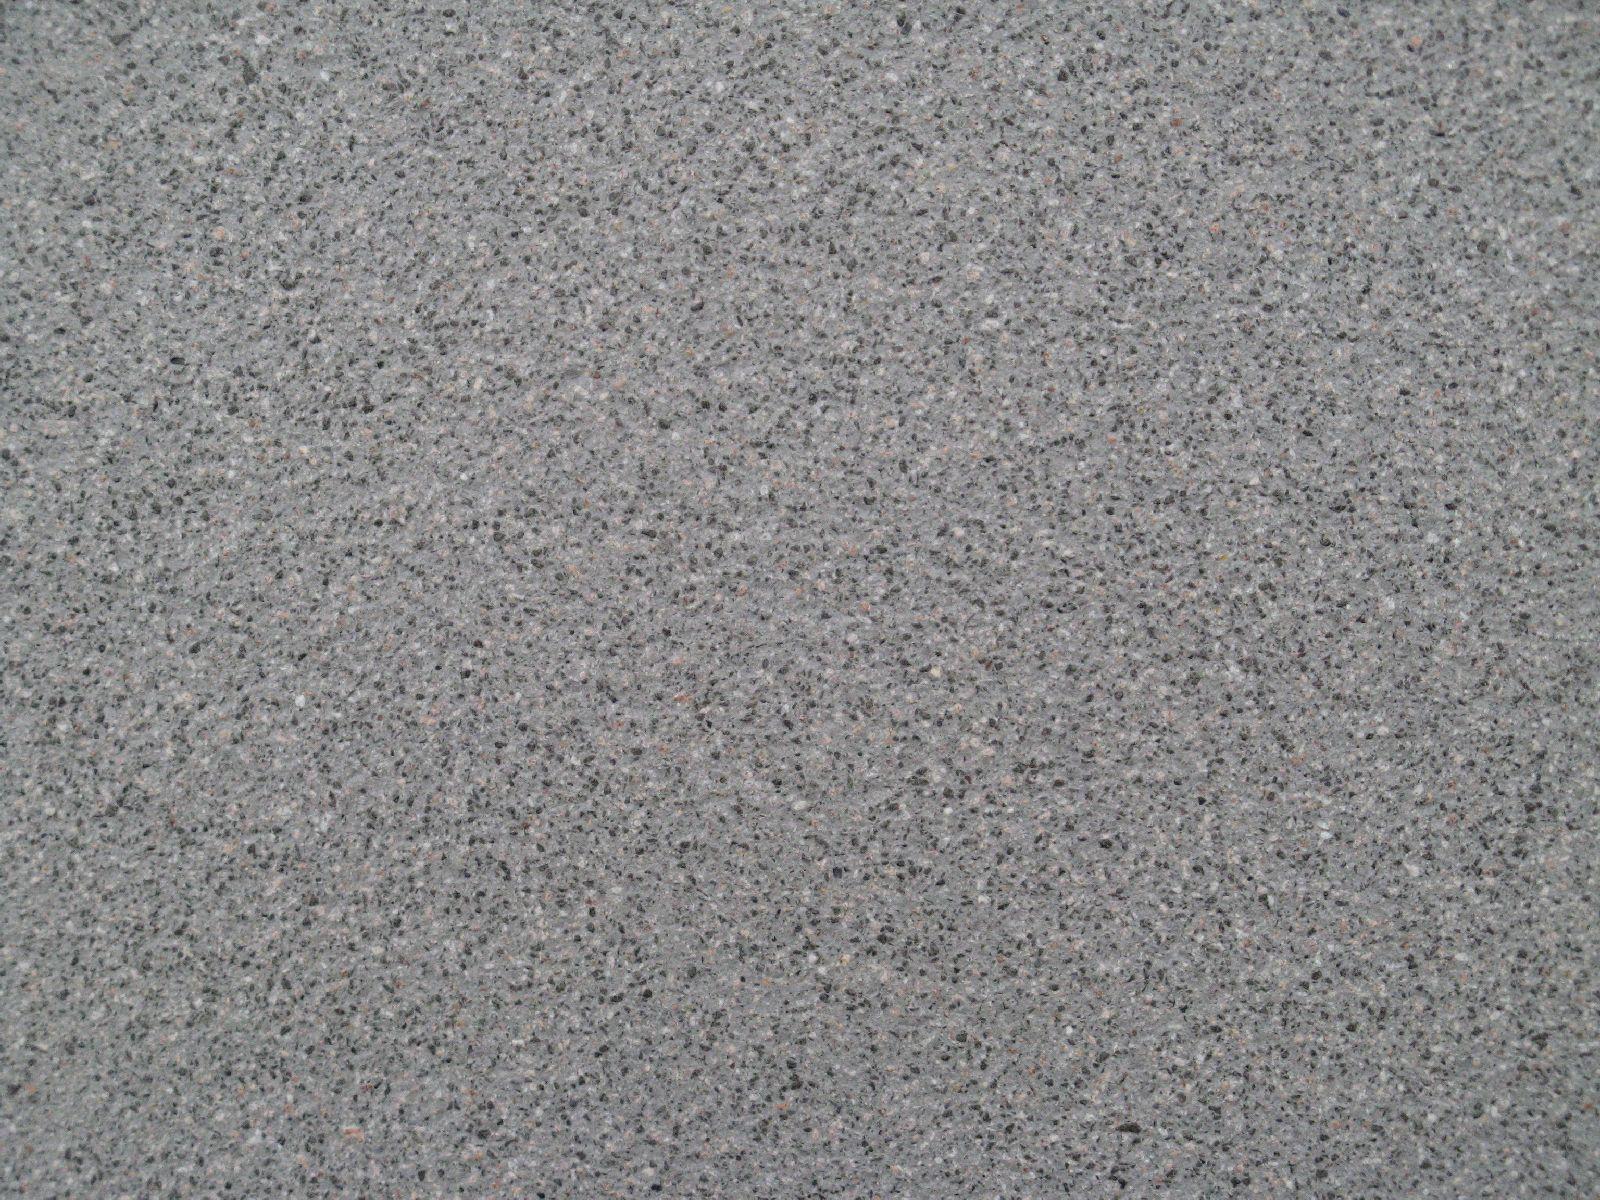 Stone_Texture_B_5729